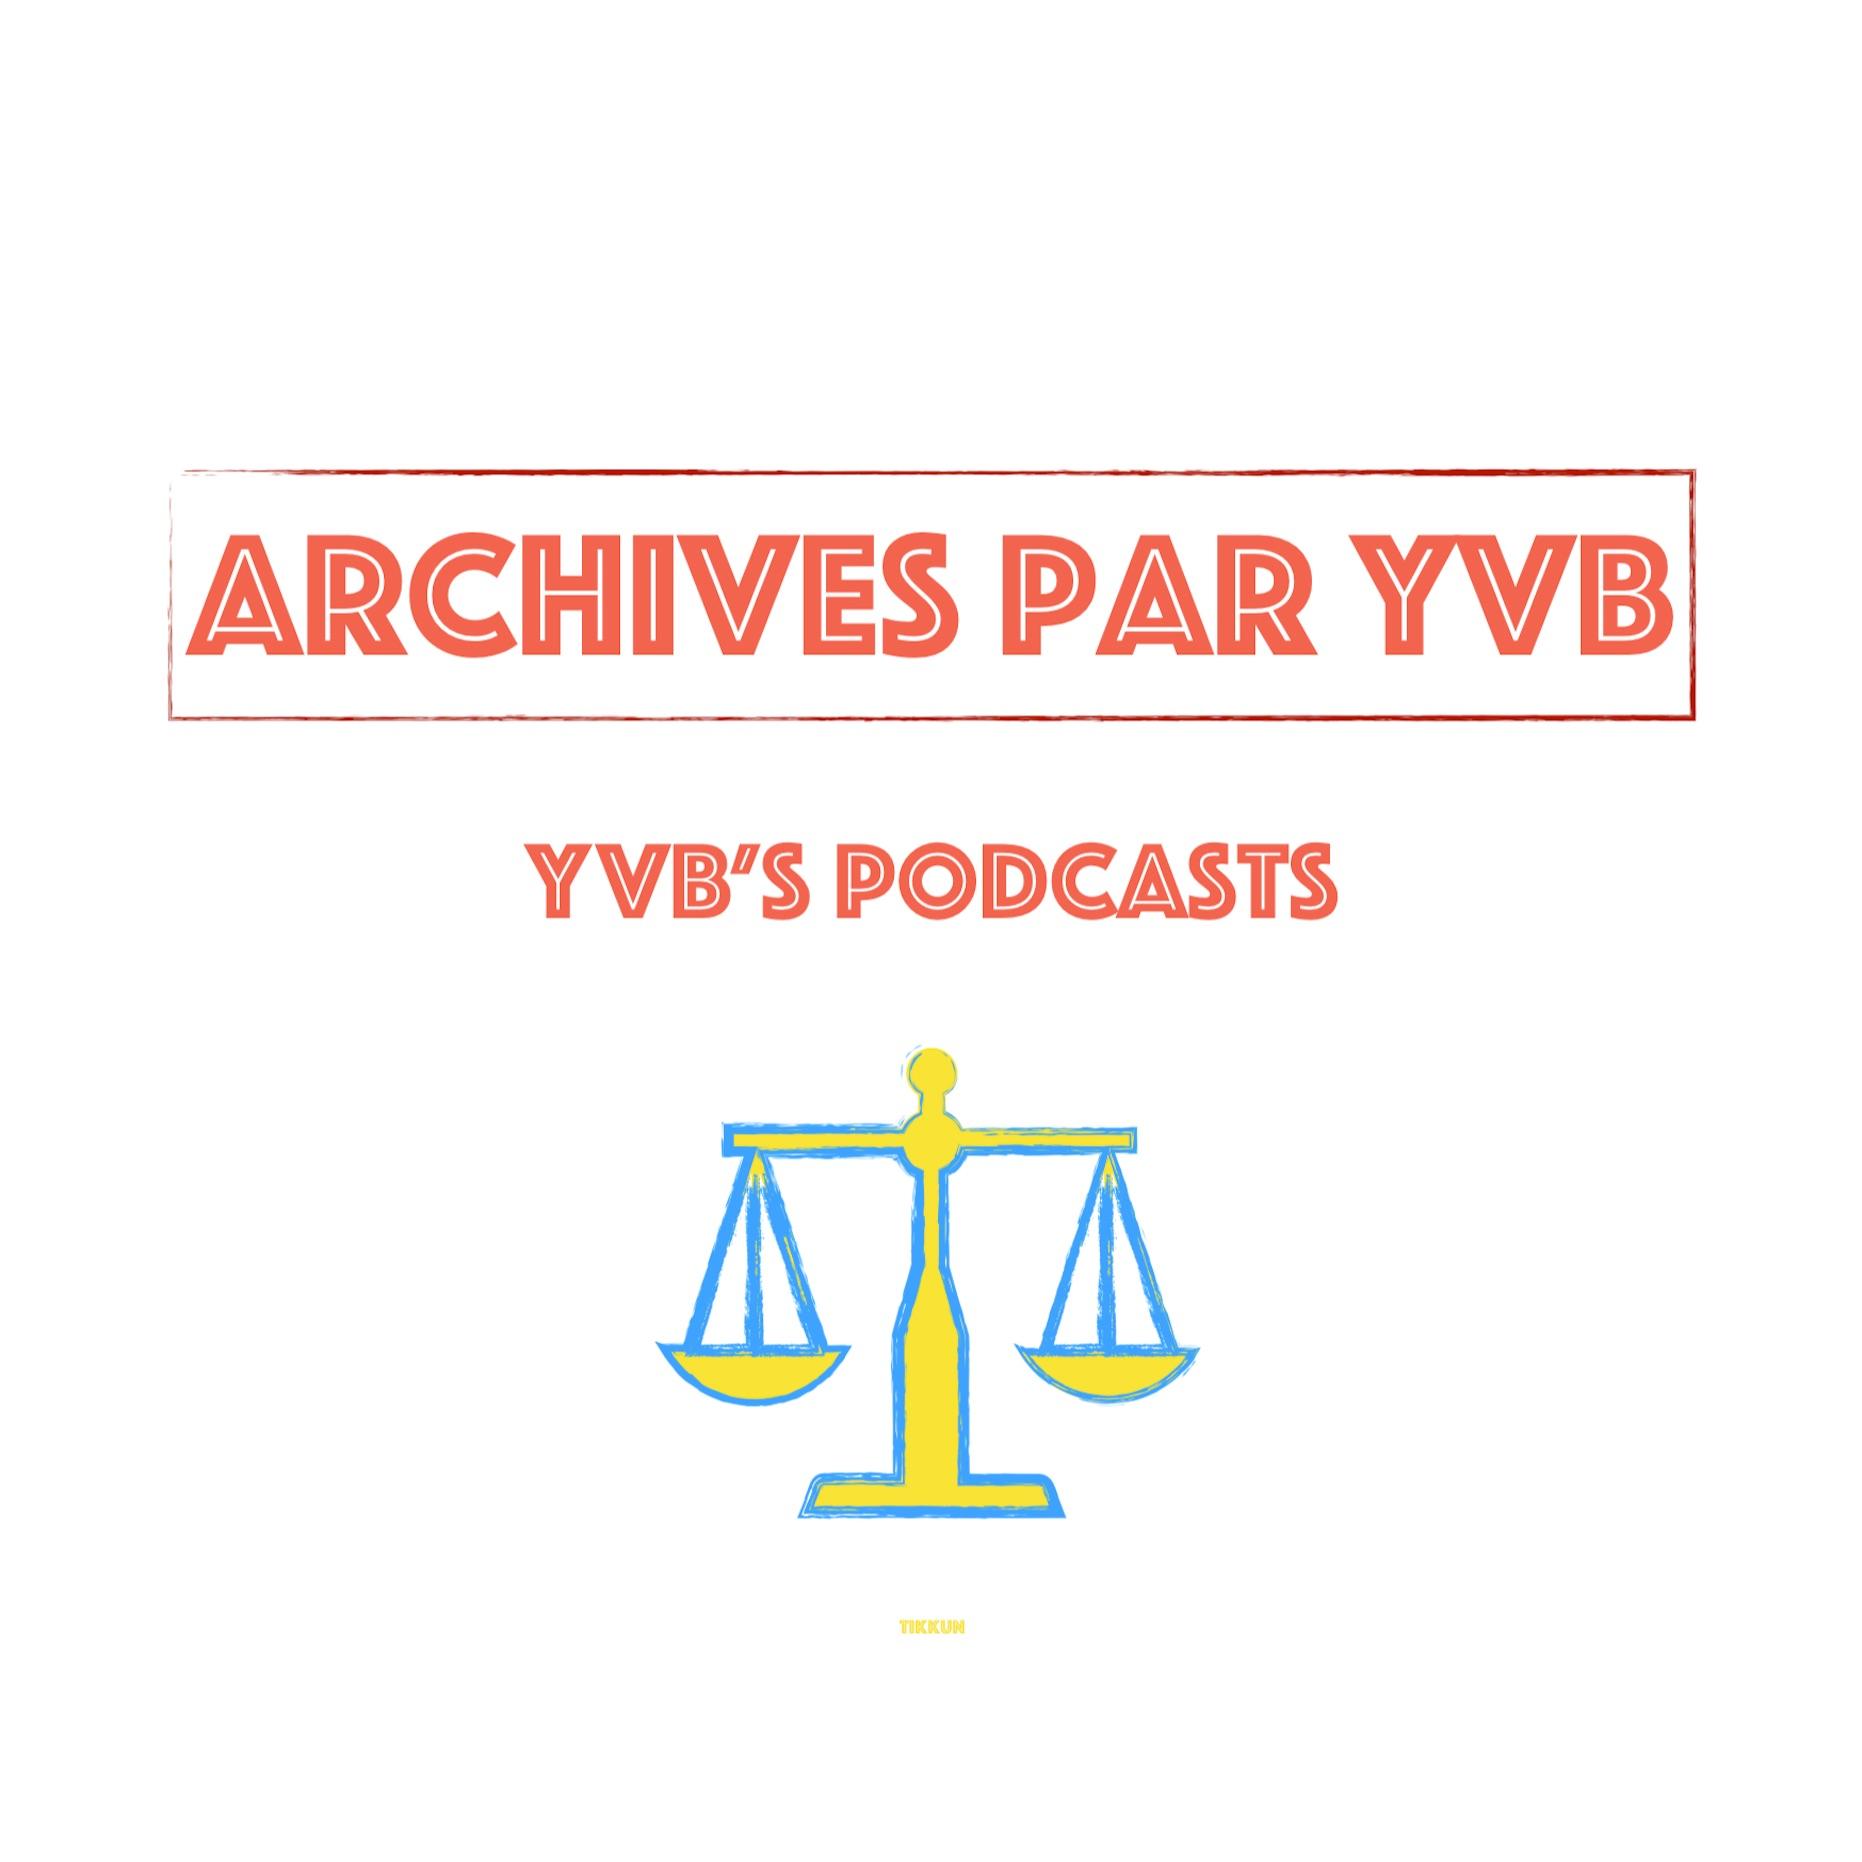 Archives par YVB